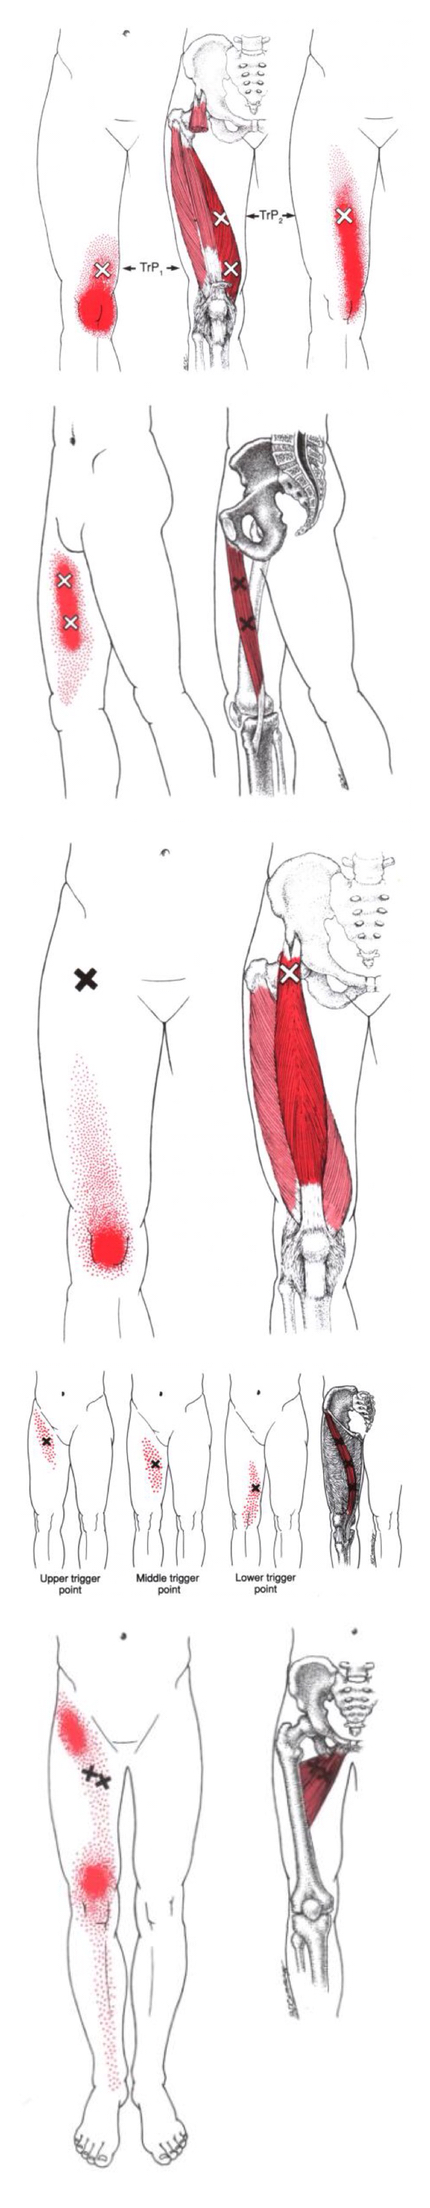 Anteromedial Knee Pain | Health ❤ Myofascial Release ❤ Trigger ...